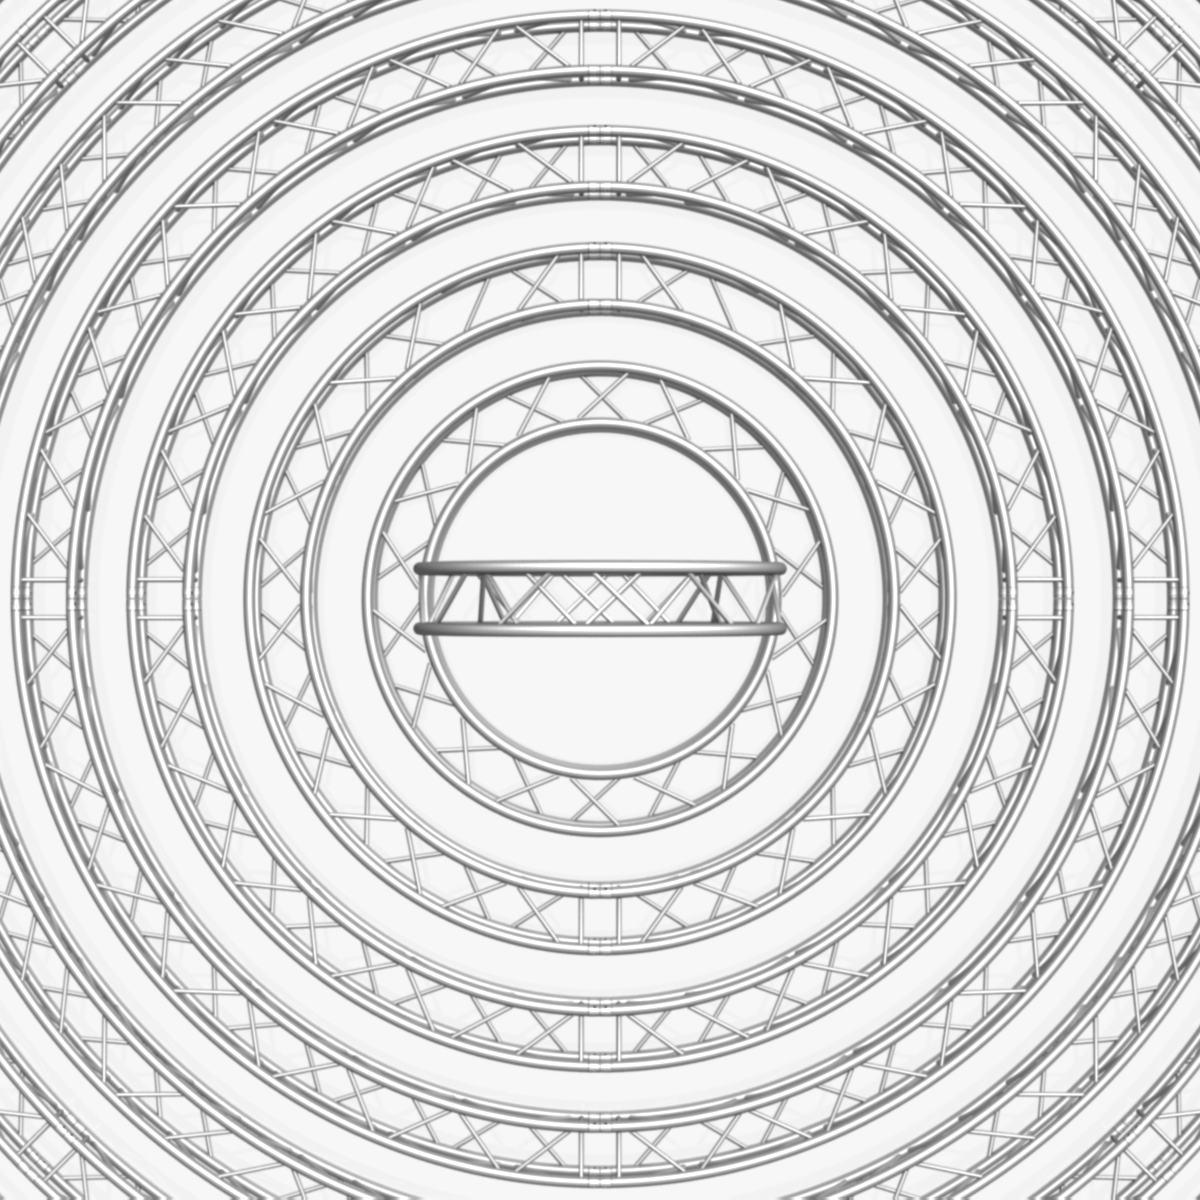 circle square truss modular collection 3d model 3ds max dxf fbx c4d dae  texture obj 252345